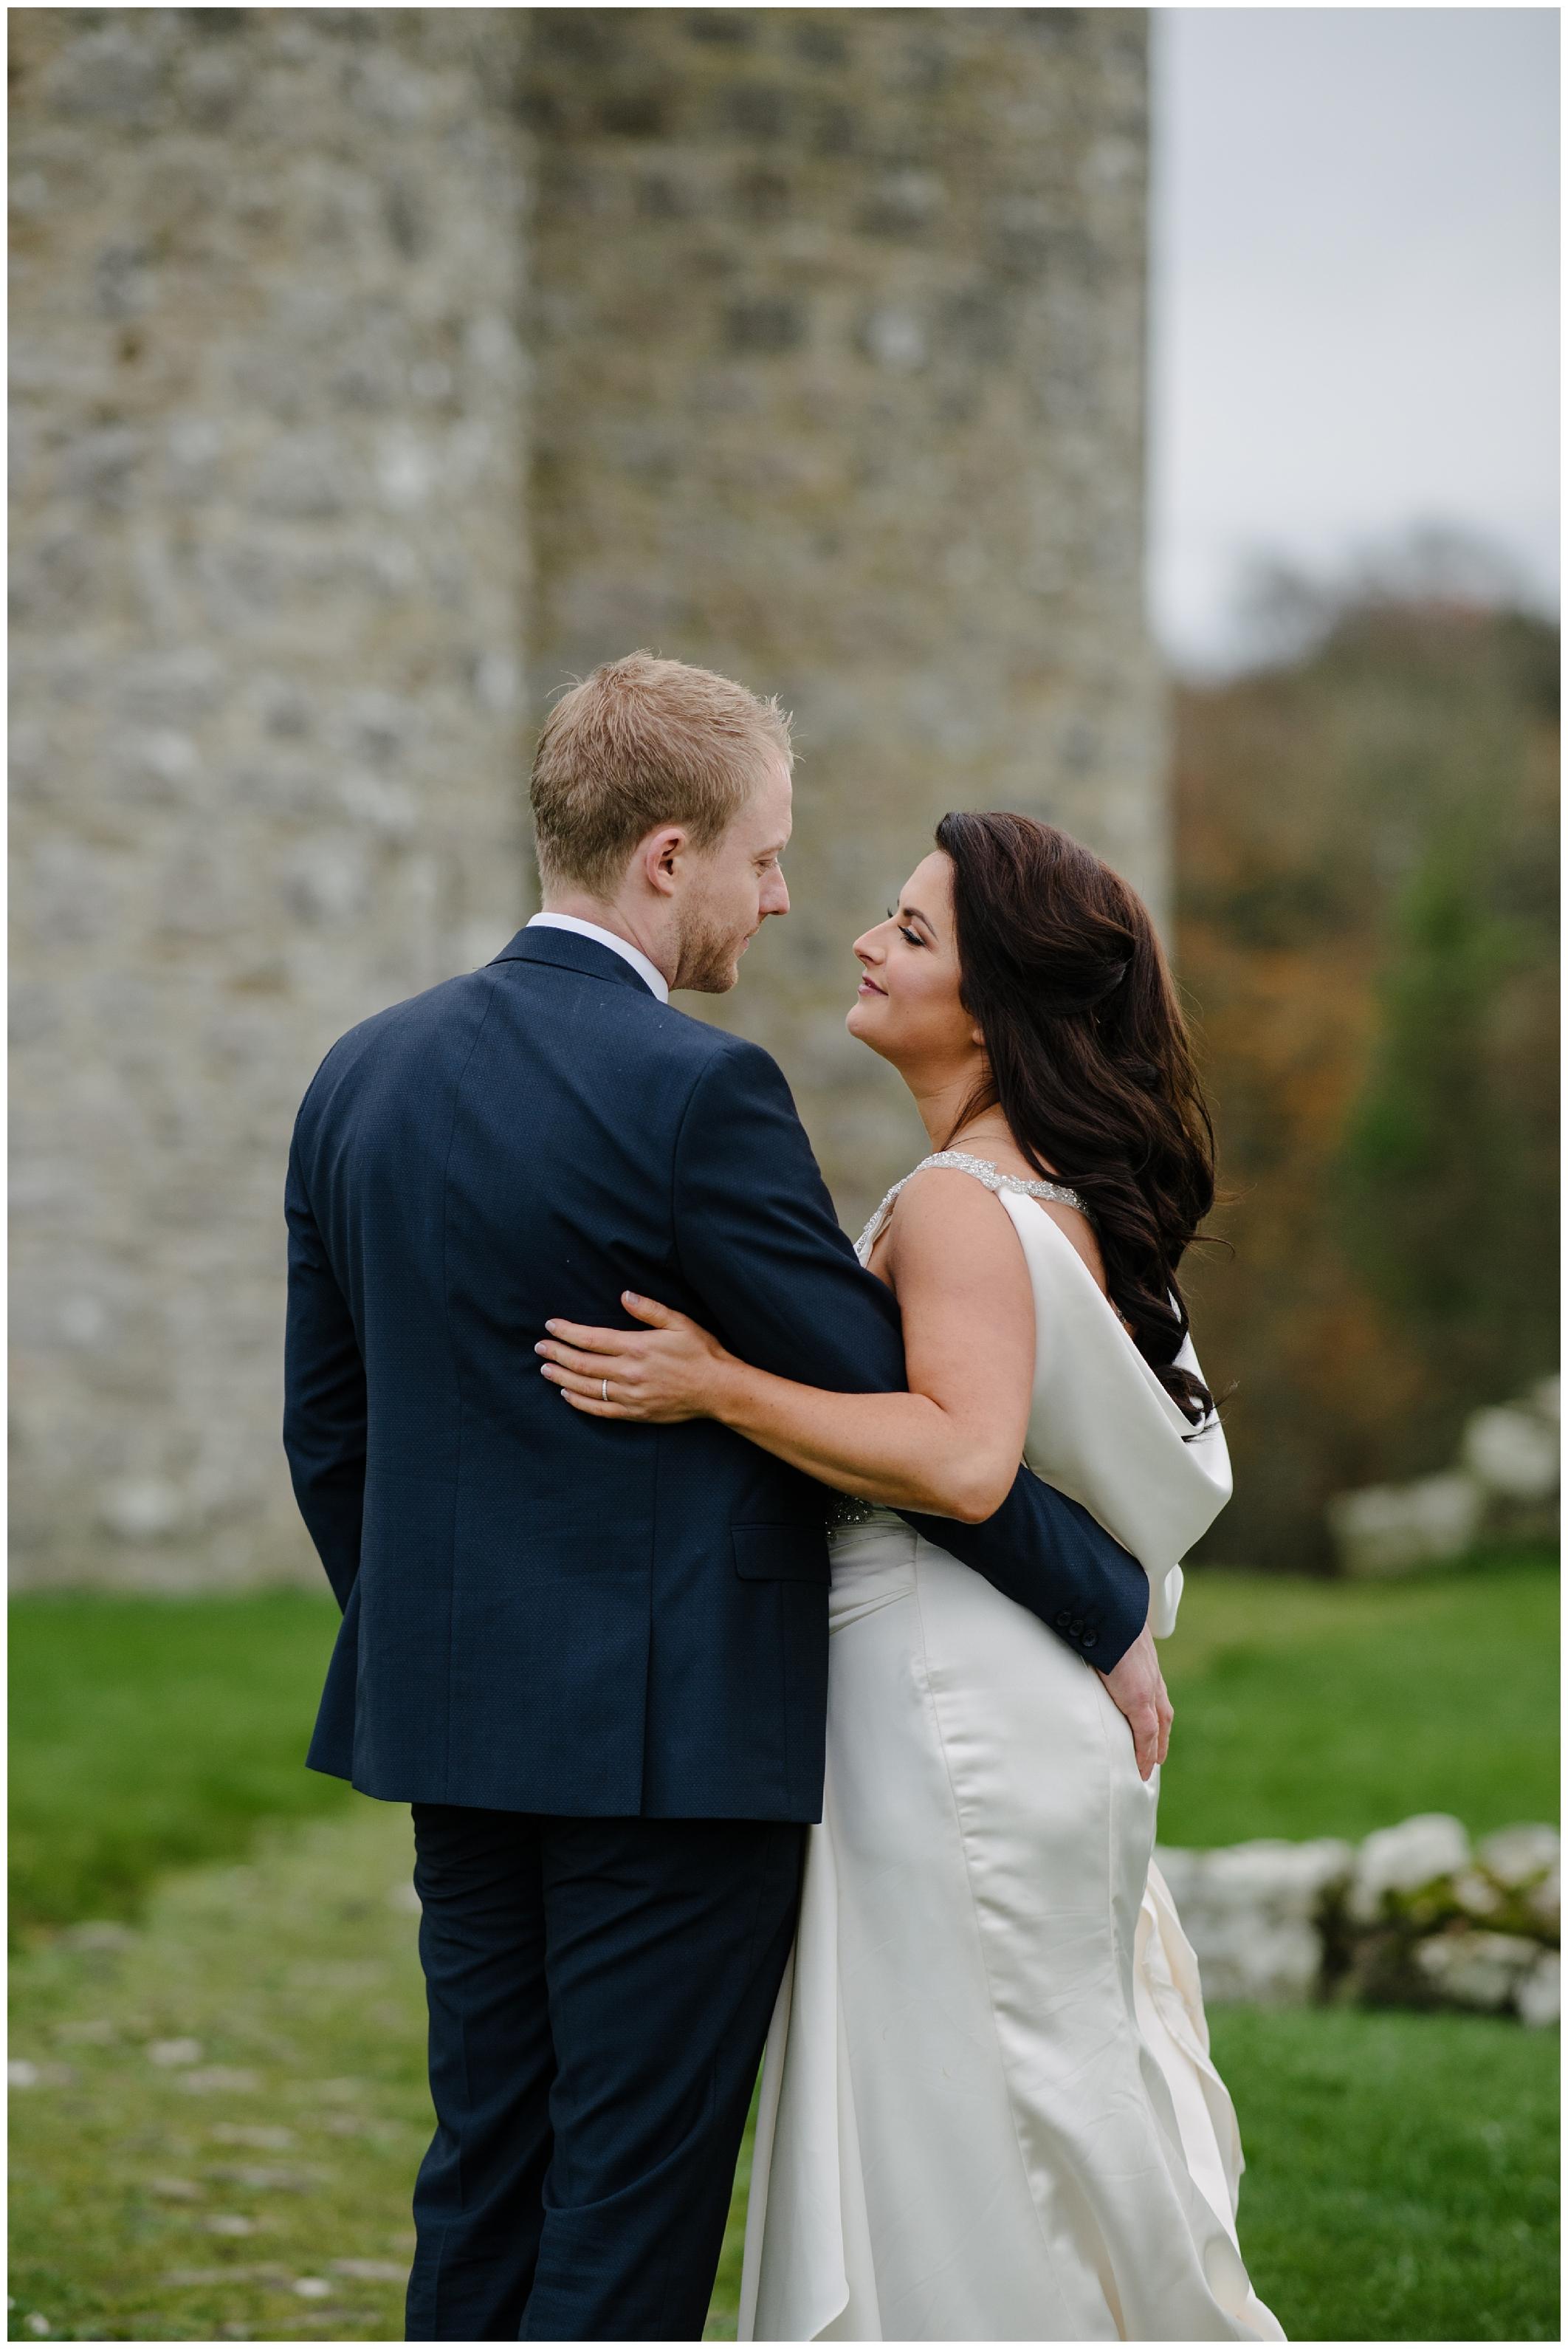 tracey_conor__wedding_jude_browne_photography_0045.jpg